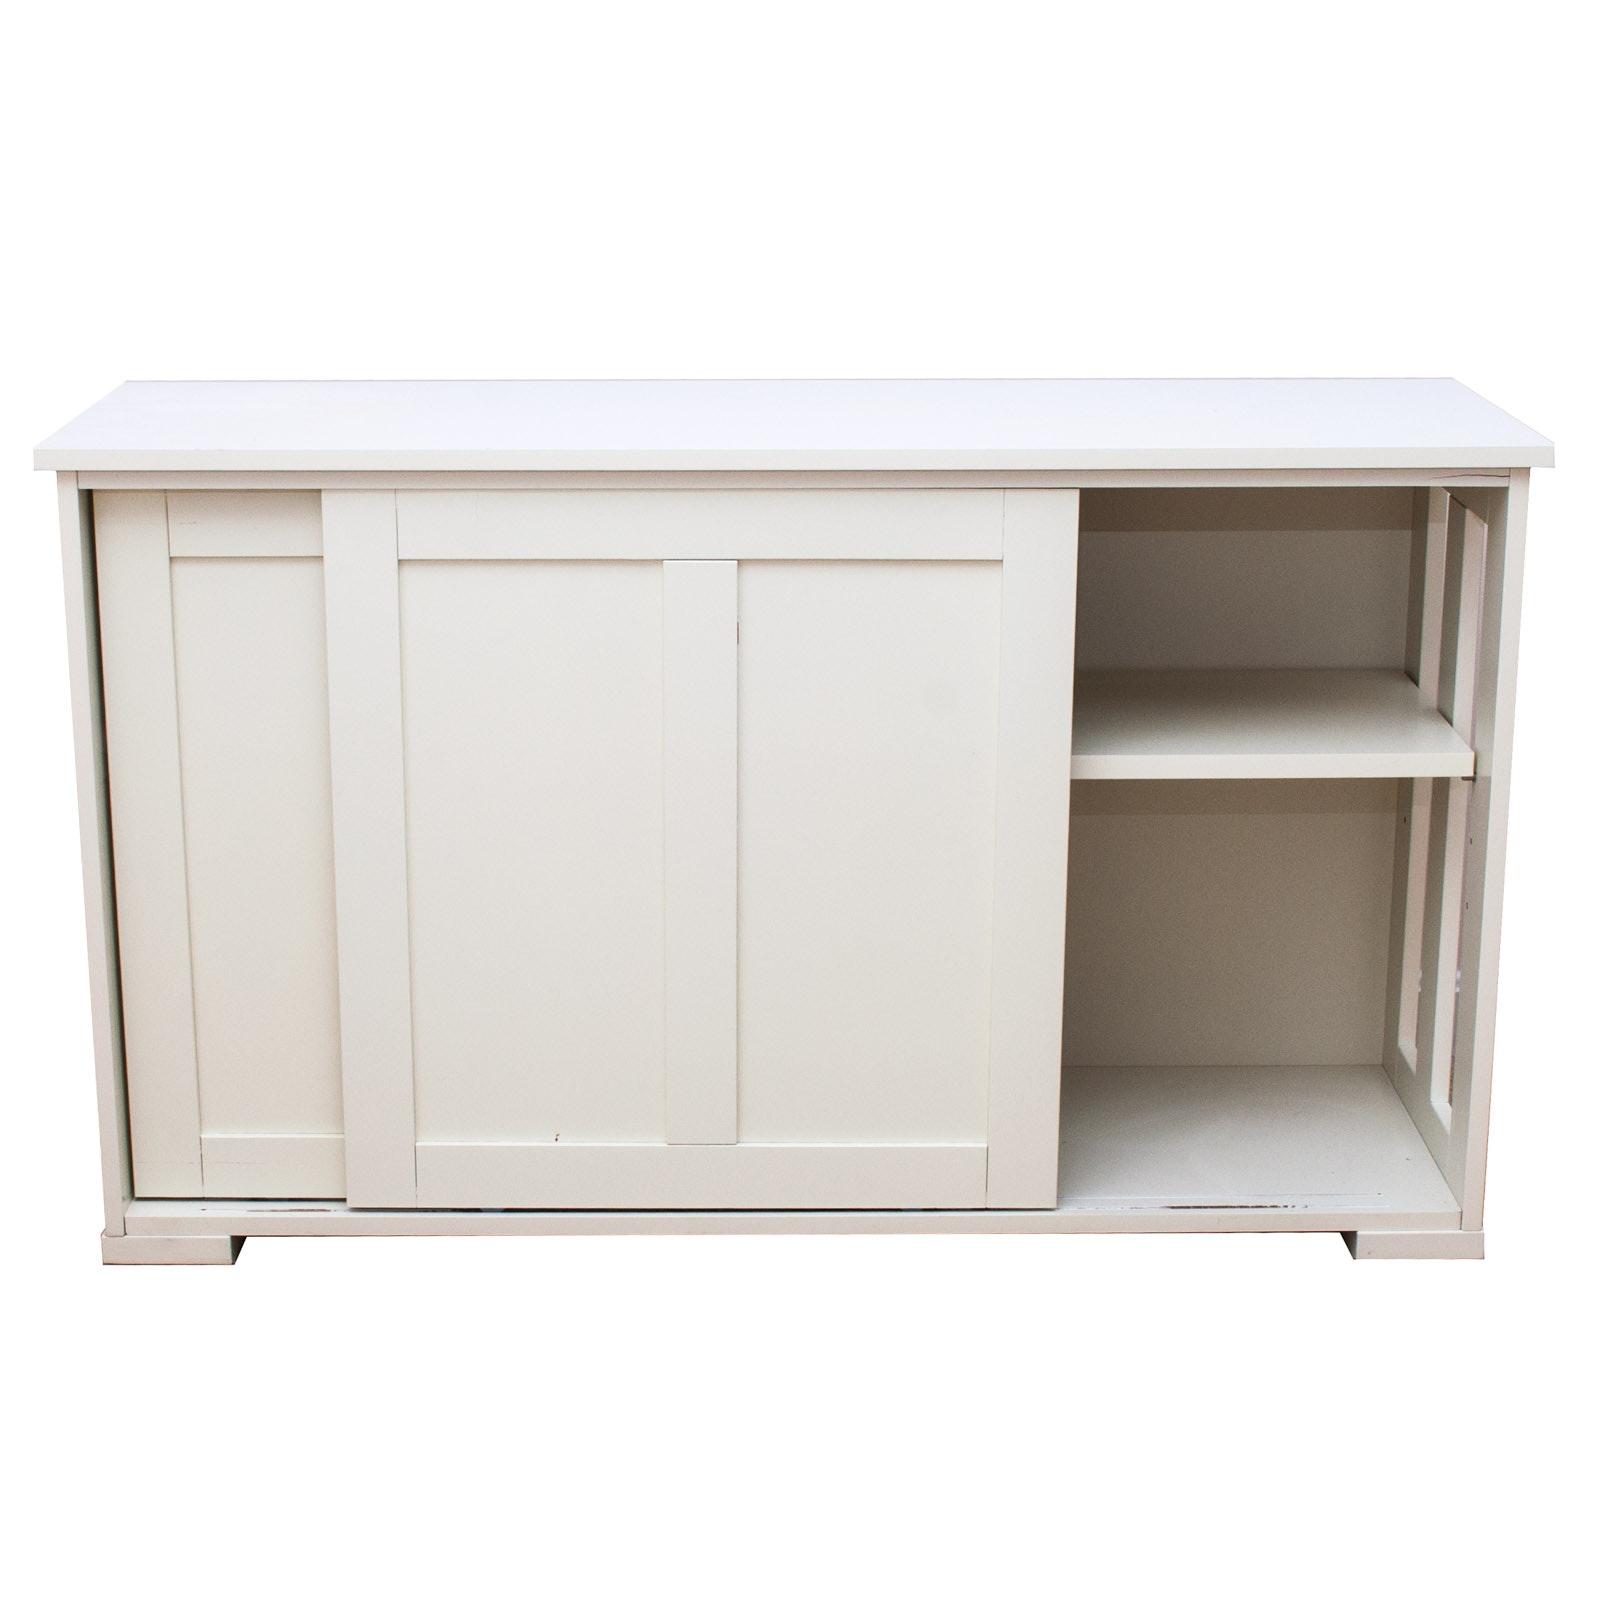 Off-White Composite Wood Sliding Door Storage Cabinet ...  sc 1 st  EBTH.com & Off-White Composite Wood Sliding Door Storage Cabinet : EBTH